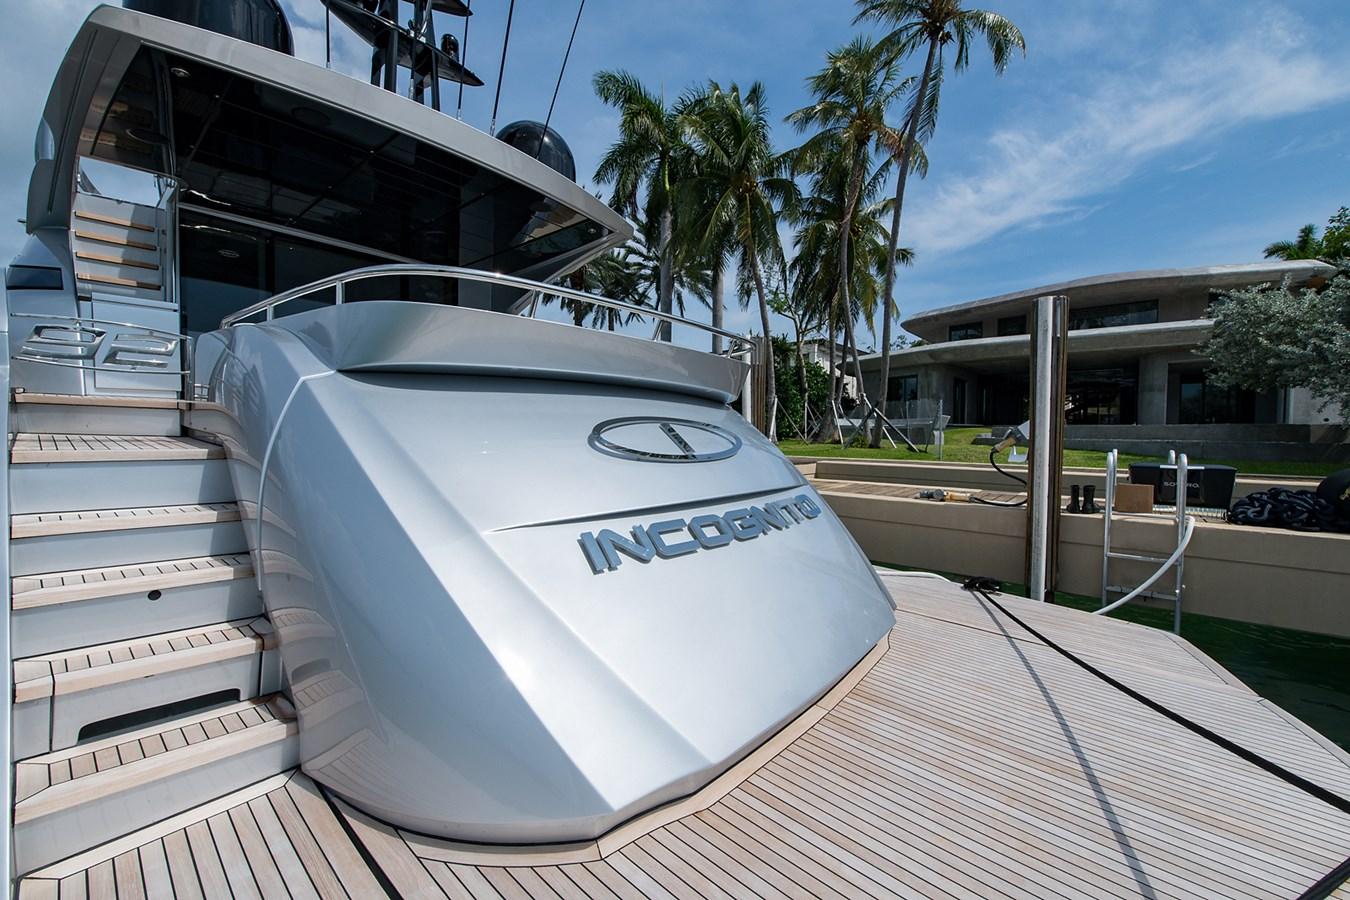 Incognito_Swim Platform1 2012 PERSHING  Motor Yacht 2810542